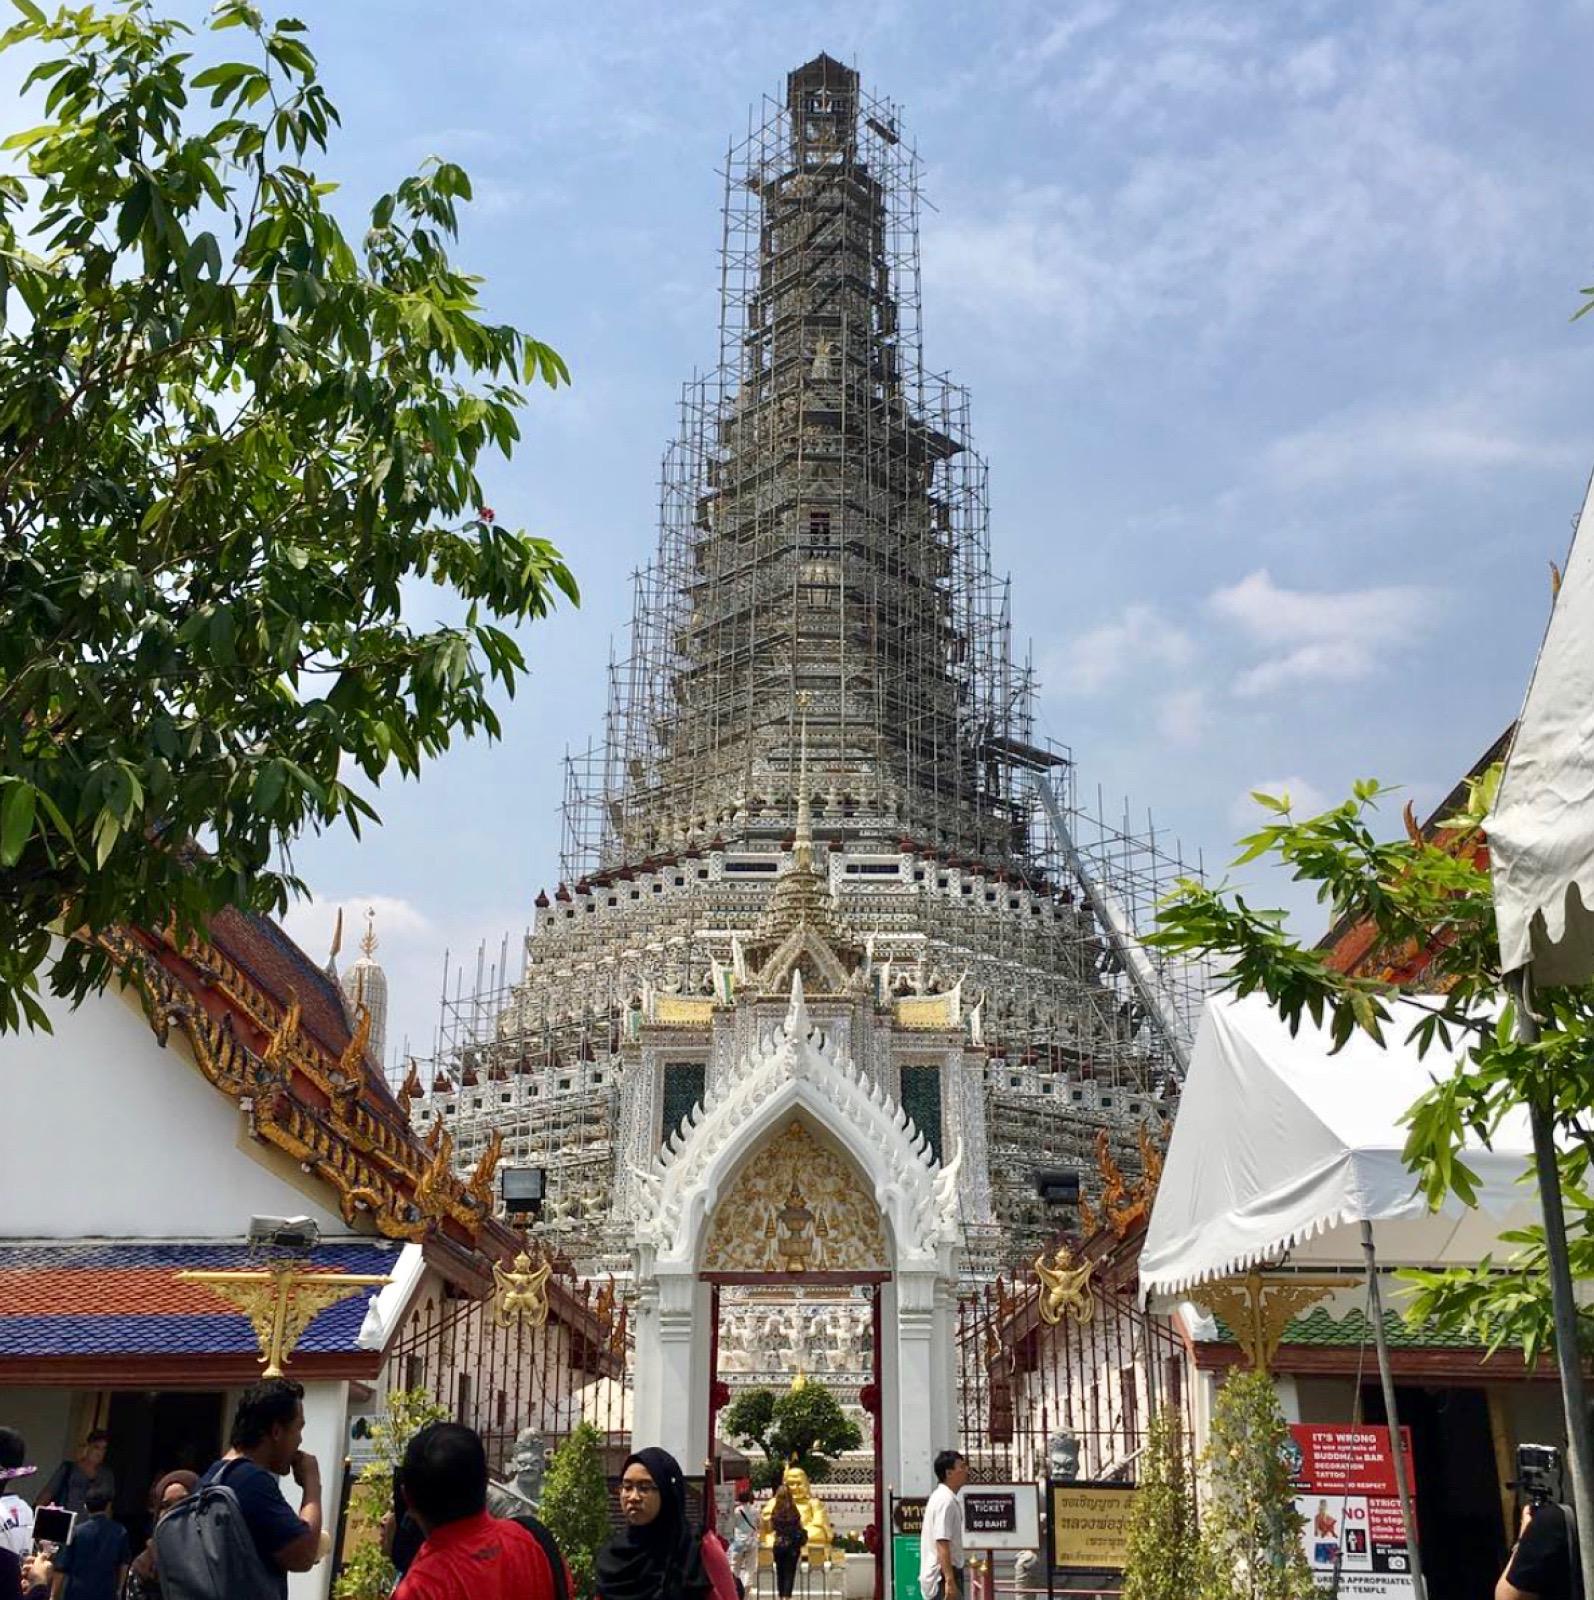 Thailand, Bangkok: Wat Arun Tempel, der volle Name ist: Wat Arun Ratchawararam Ratchaworamahaviharn